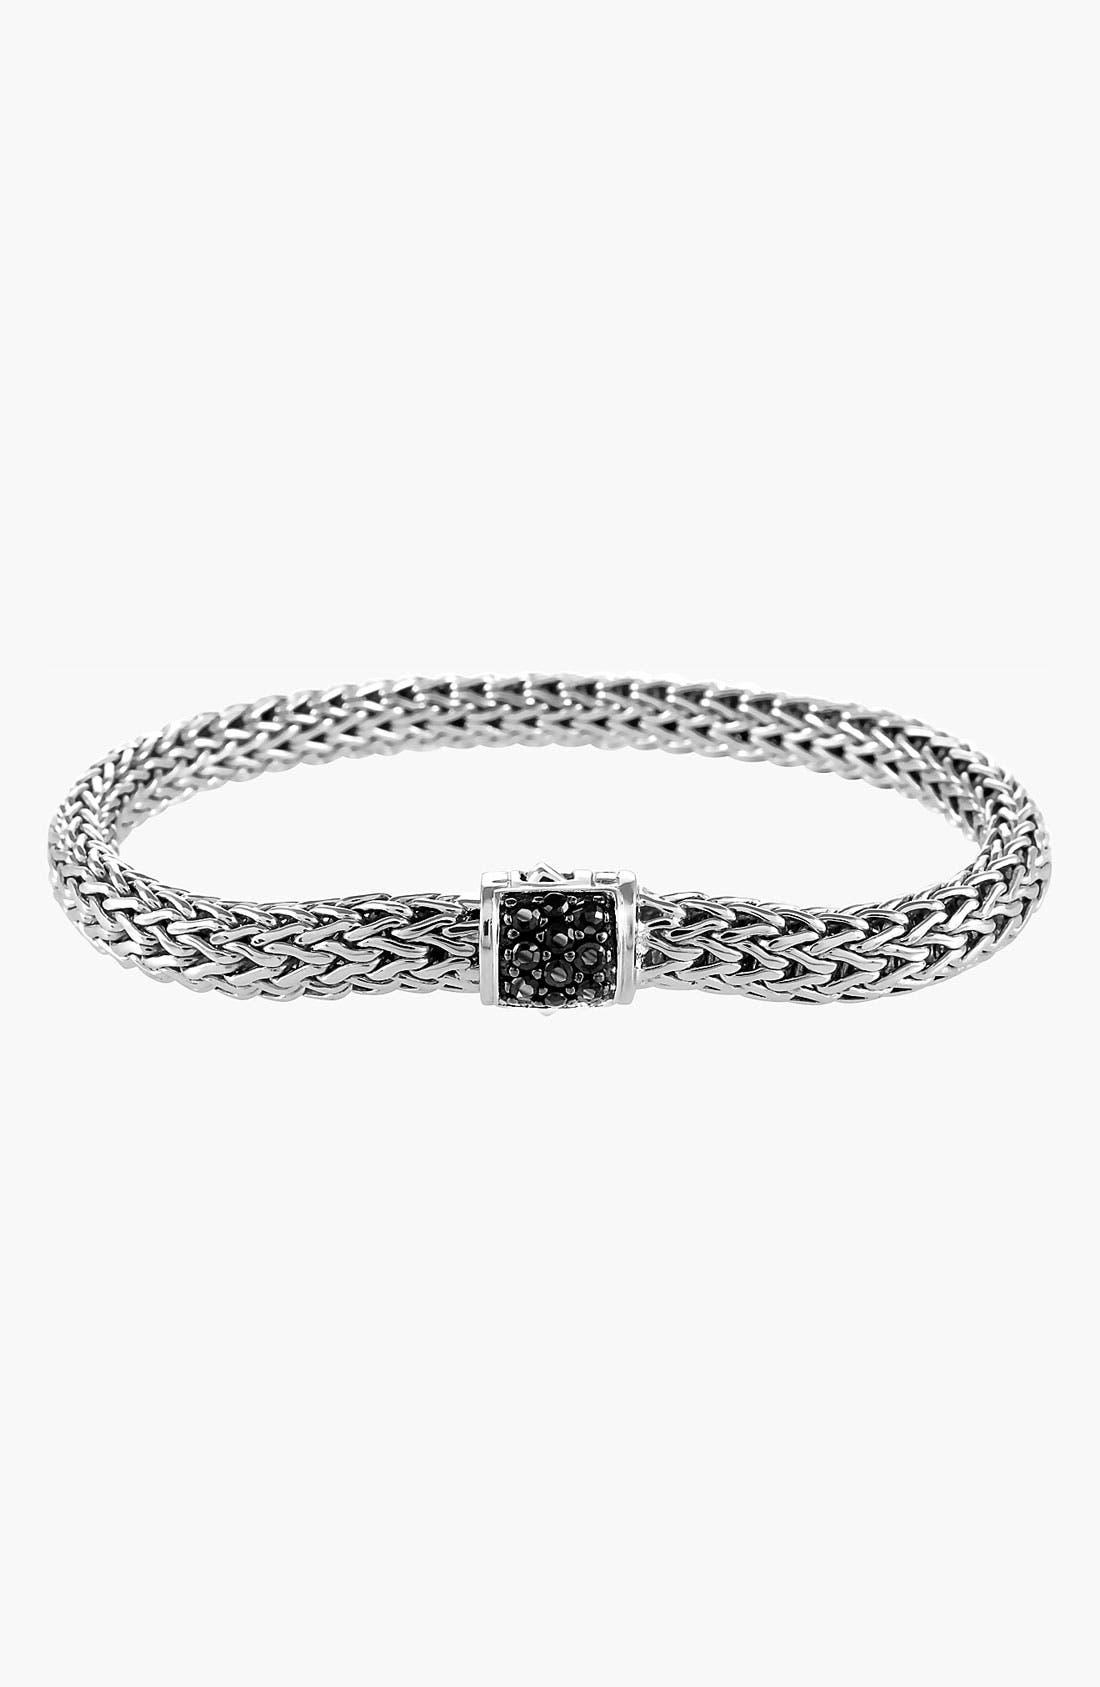 Main Image - John Hardy 'Classic Chain' Bracelet